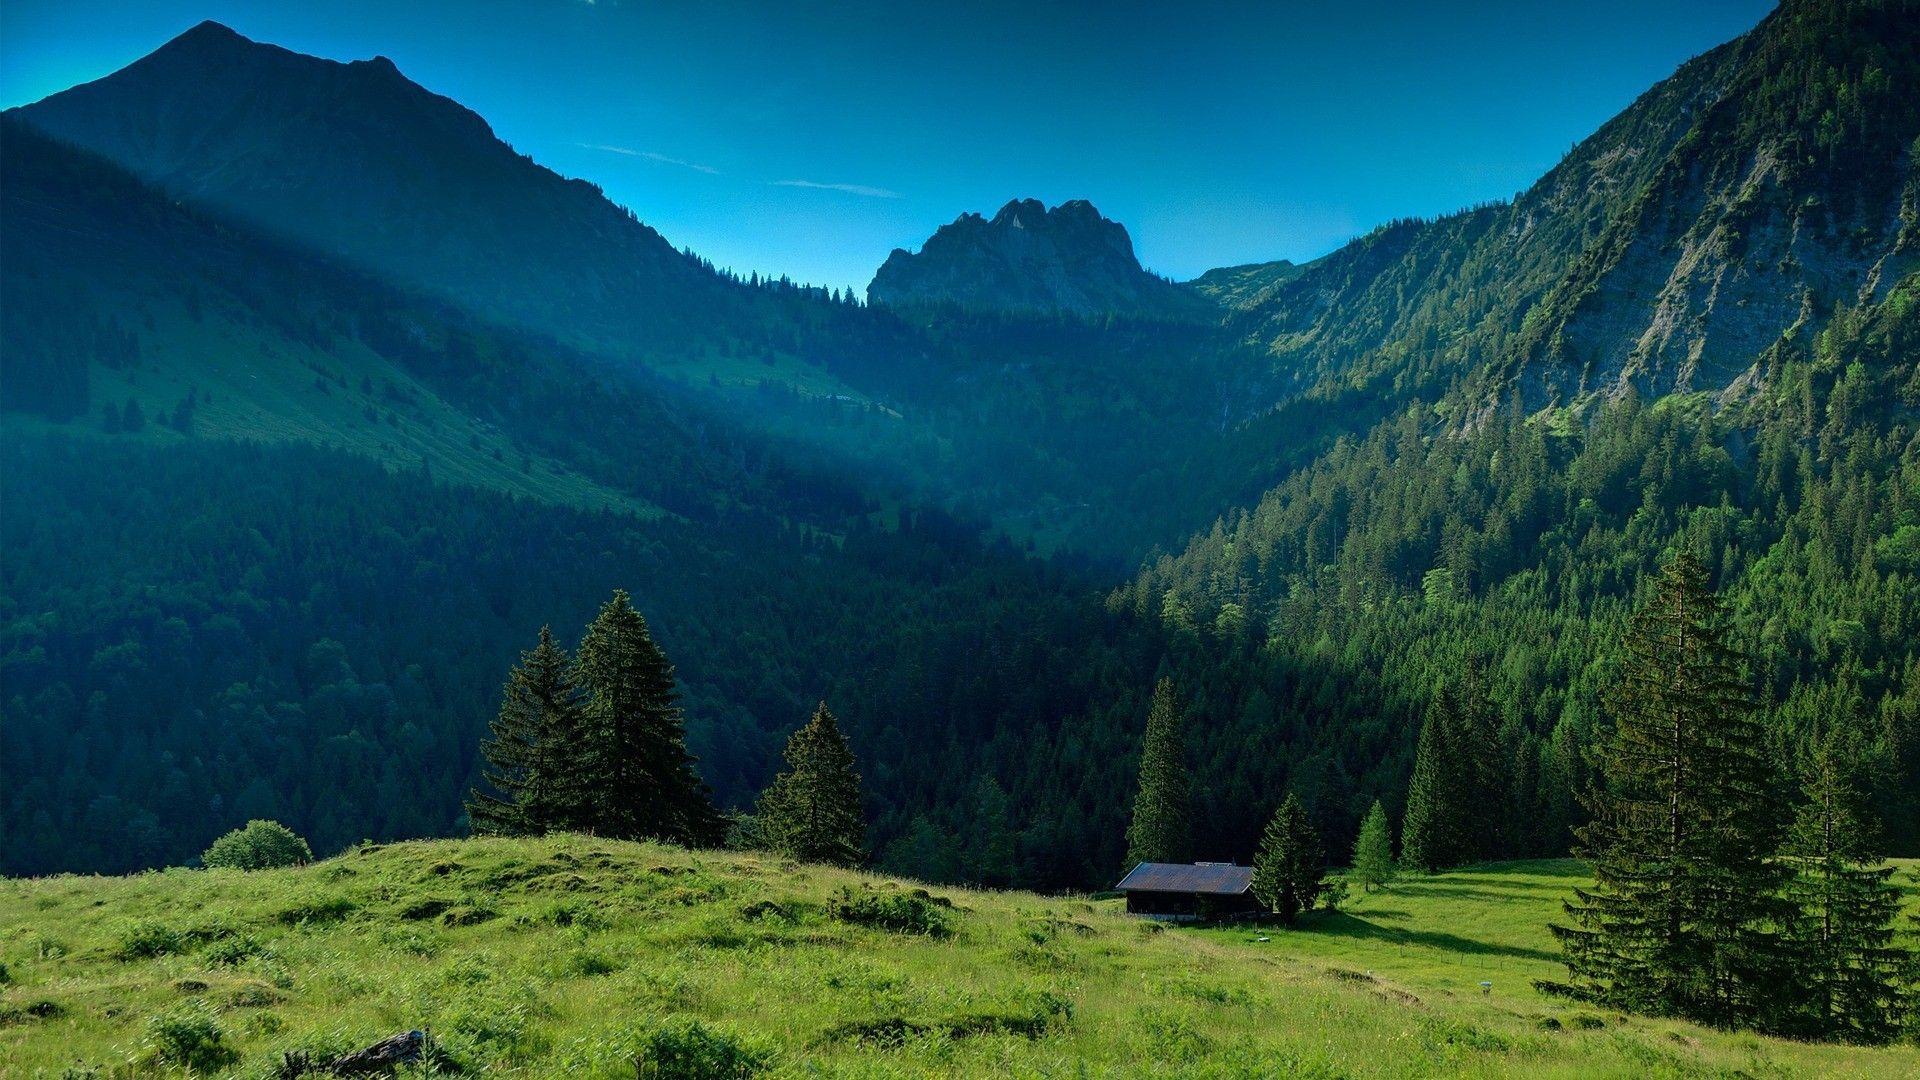 1920x1080 Wallpaper Mountains Grass Nature Landscape Paesaggi